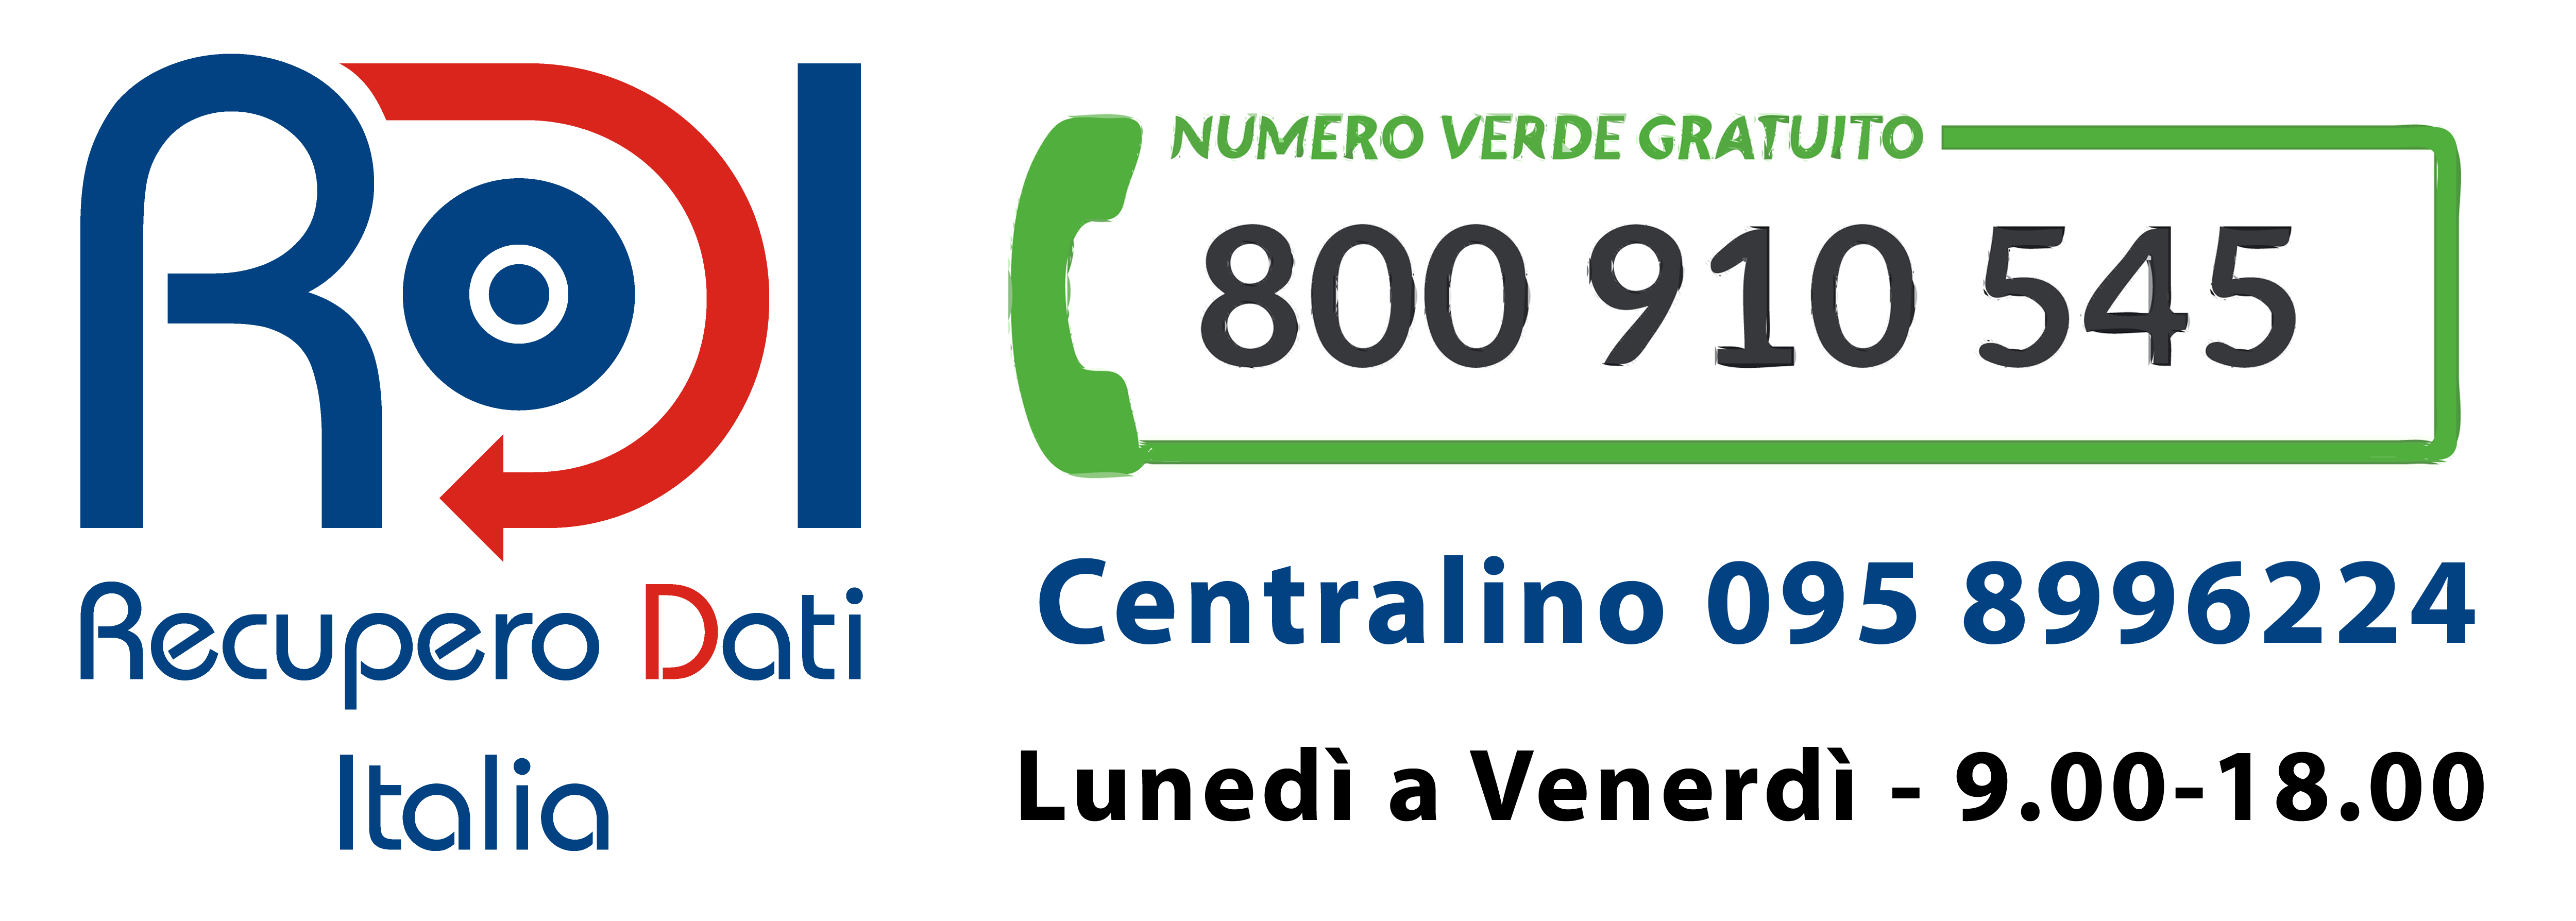 RDI RECUPERO DATI ITALIA | Recupero dati in Italia, hard disk Catania, Sicilia - perizie digital forensics